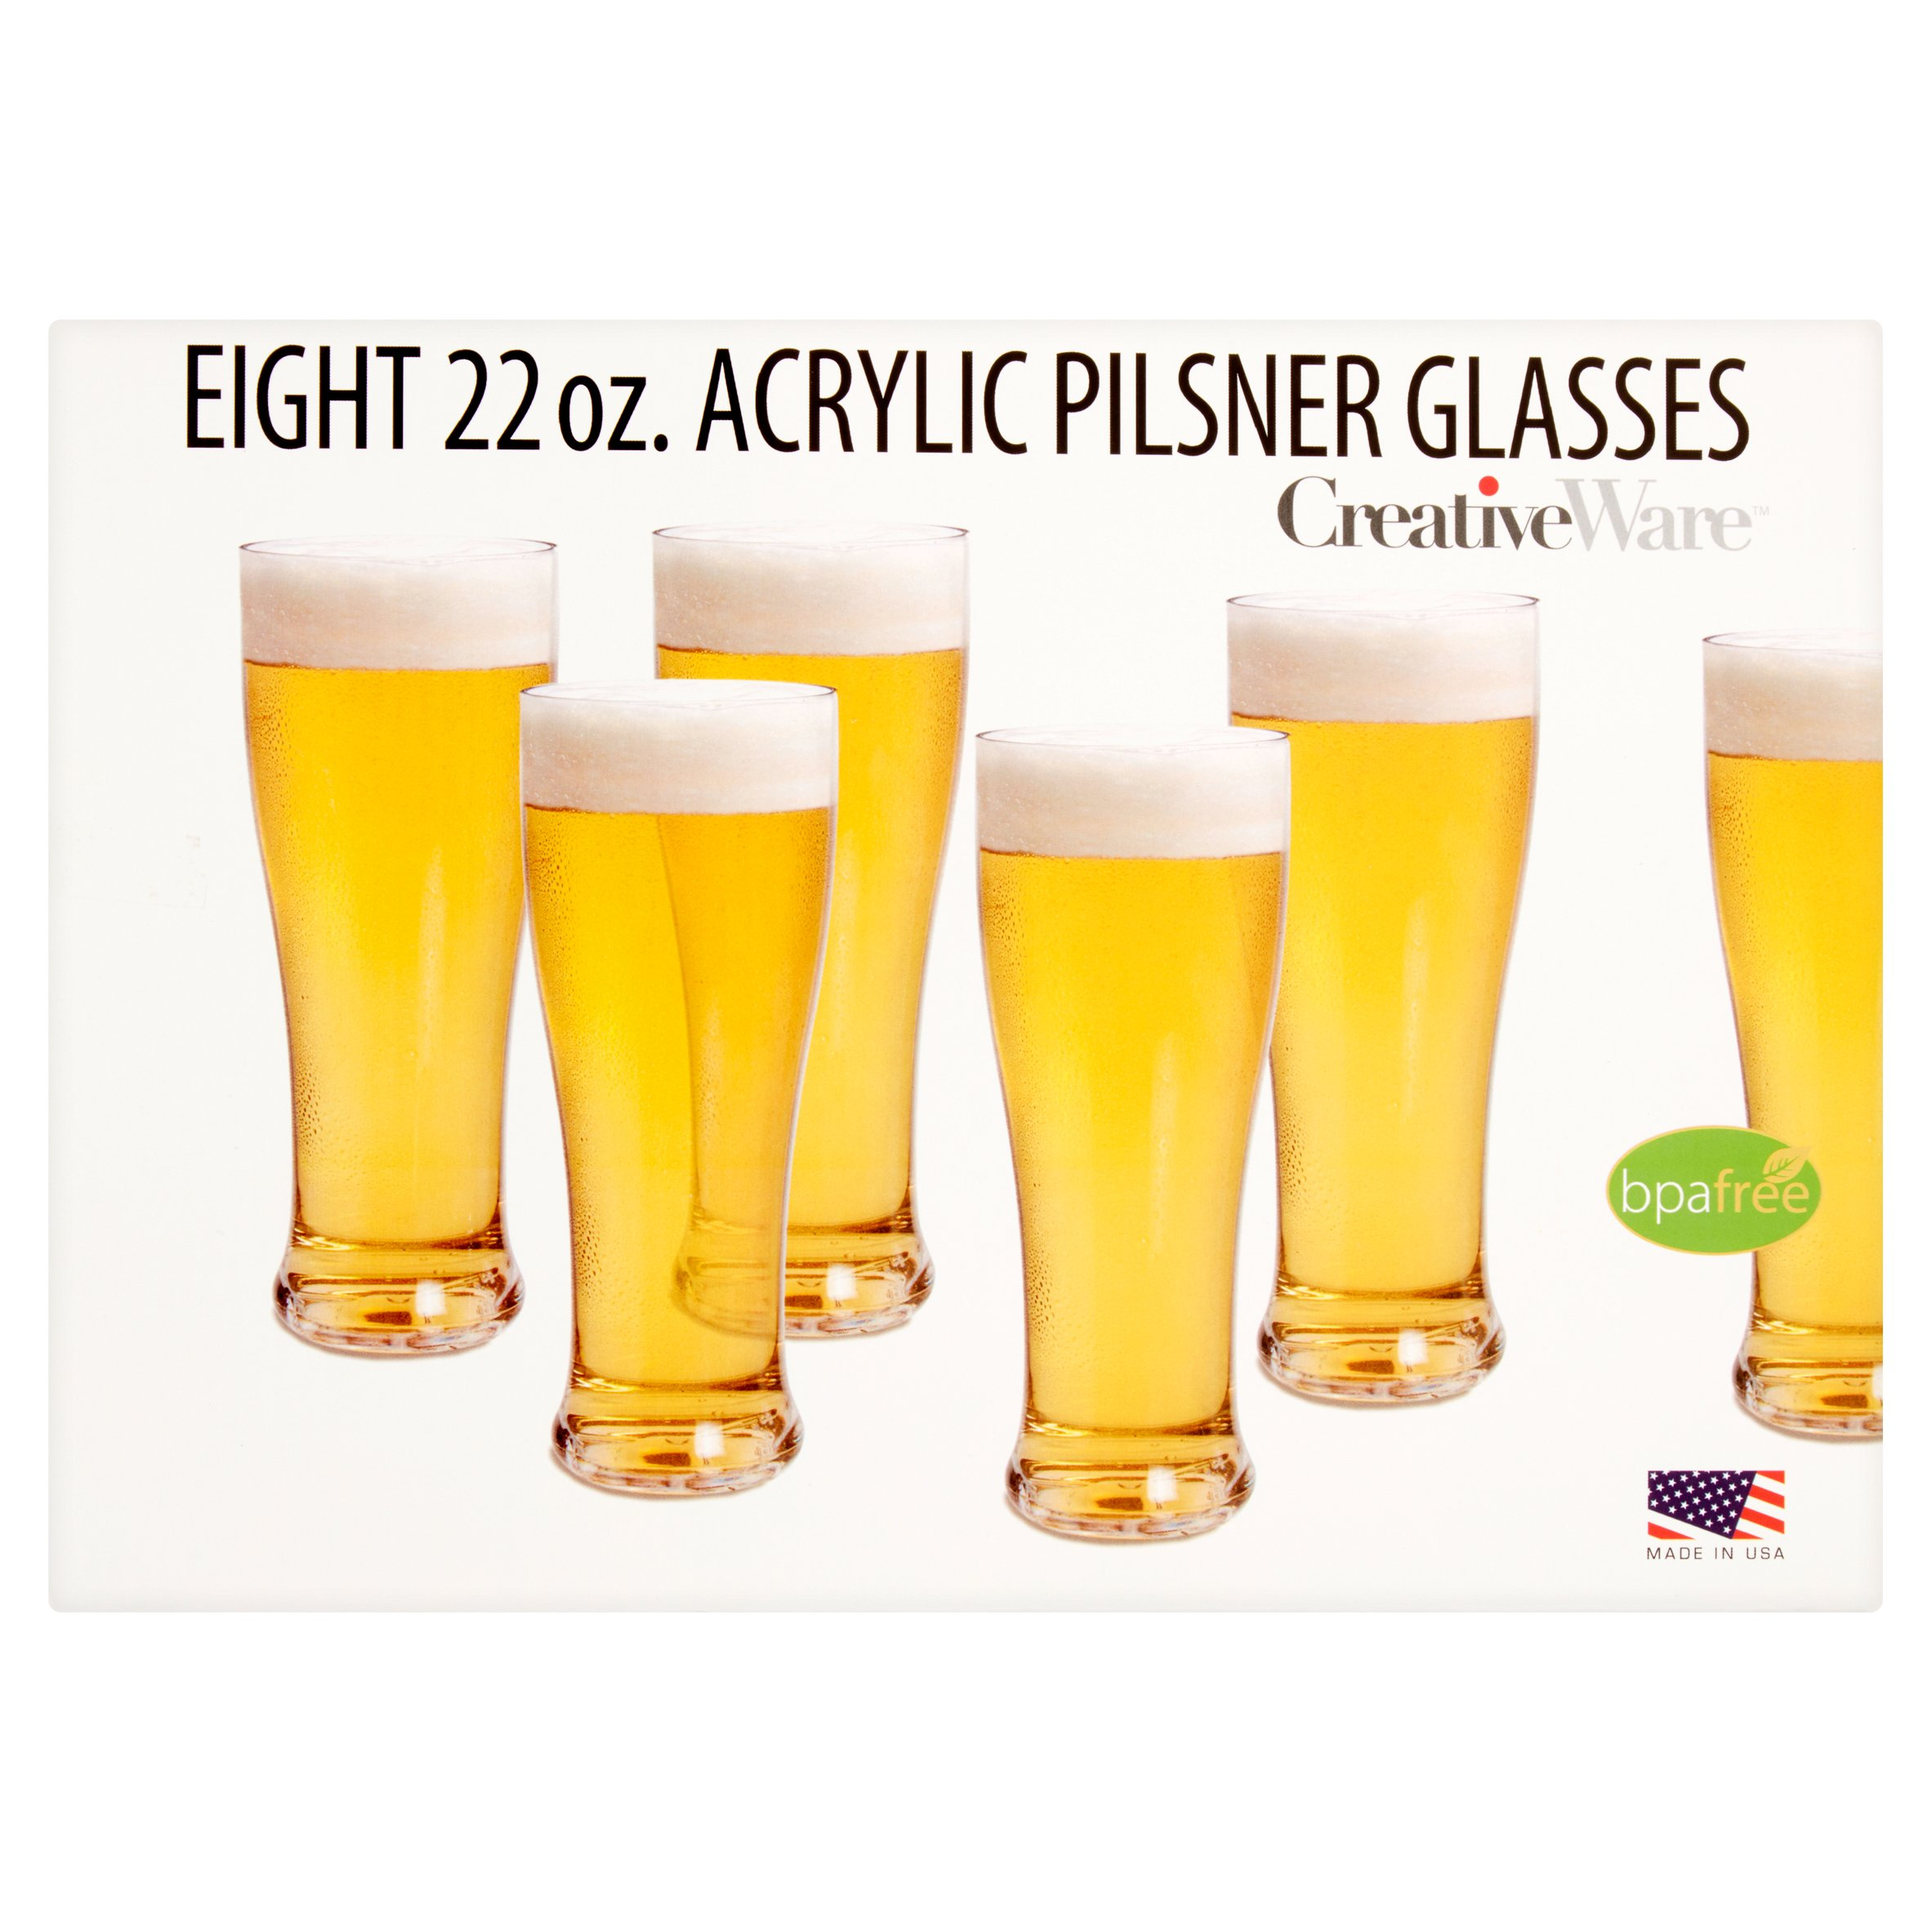 Creative Ware 22 oz. Eight Acrylic Pilsner Glasses